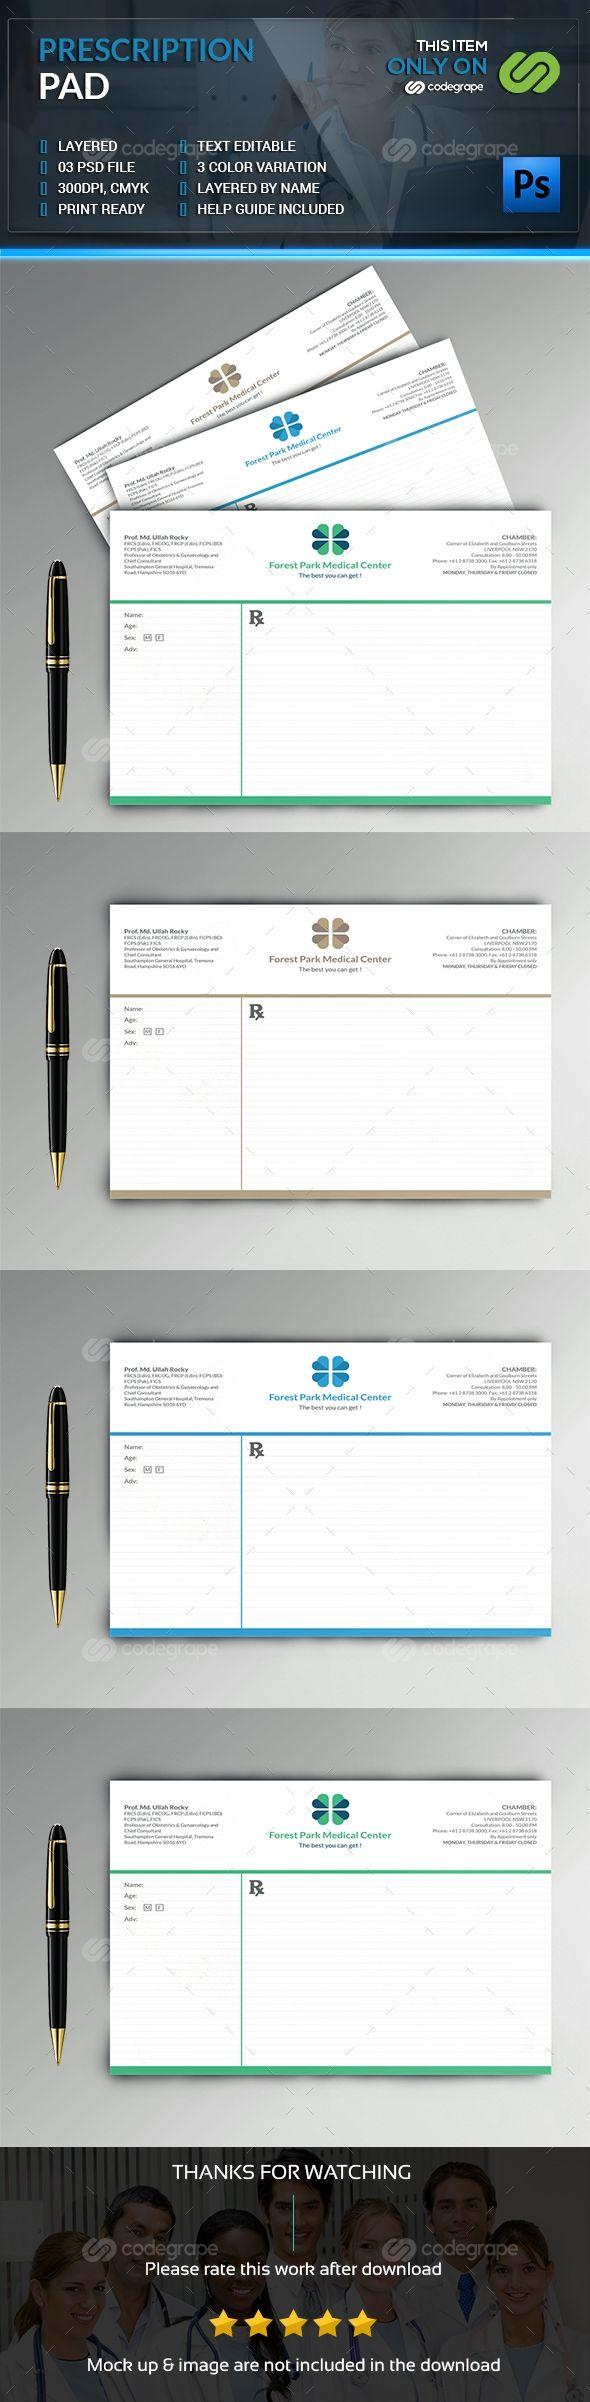 Prescription Pad on @codegrape. More Info: https://www.codegrape.com/item/prescription-pad/8054